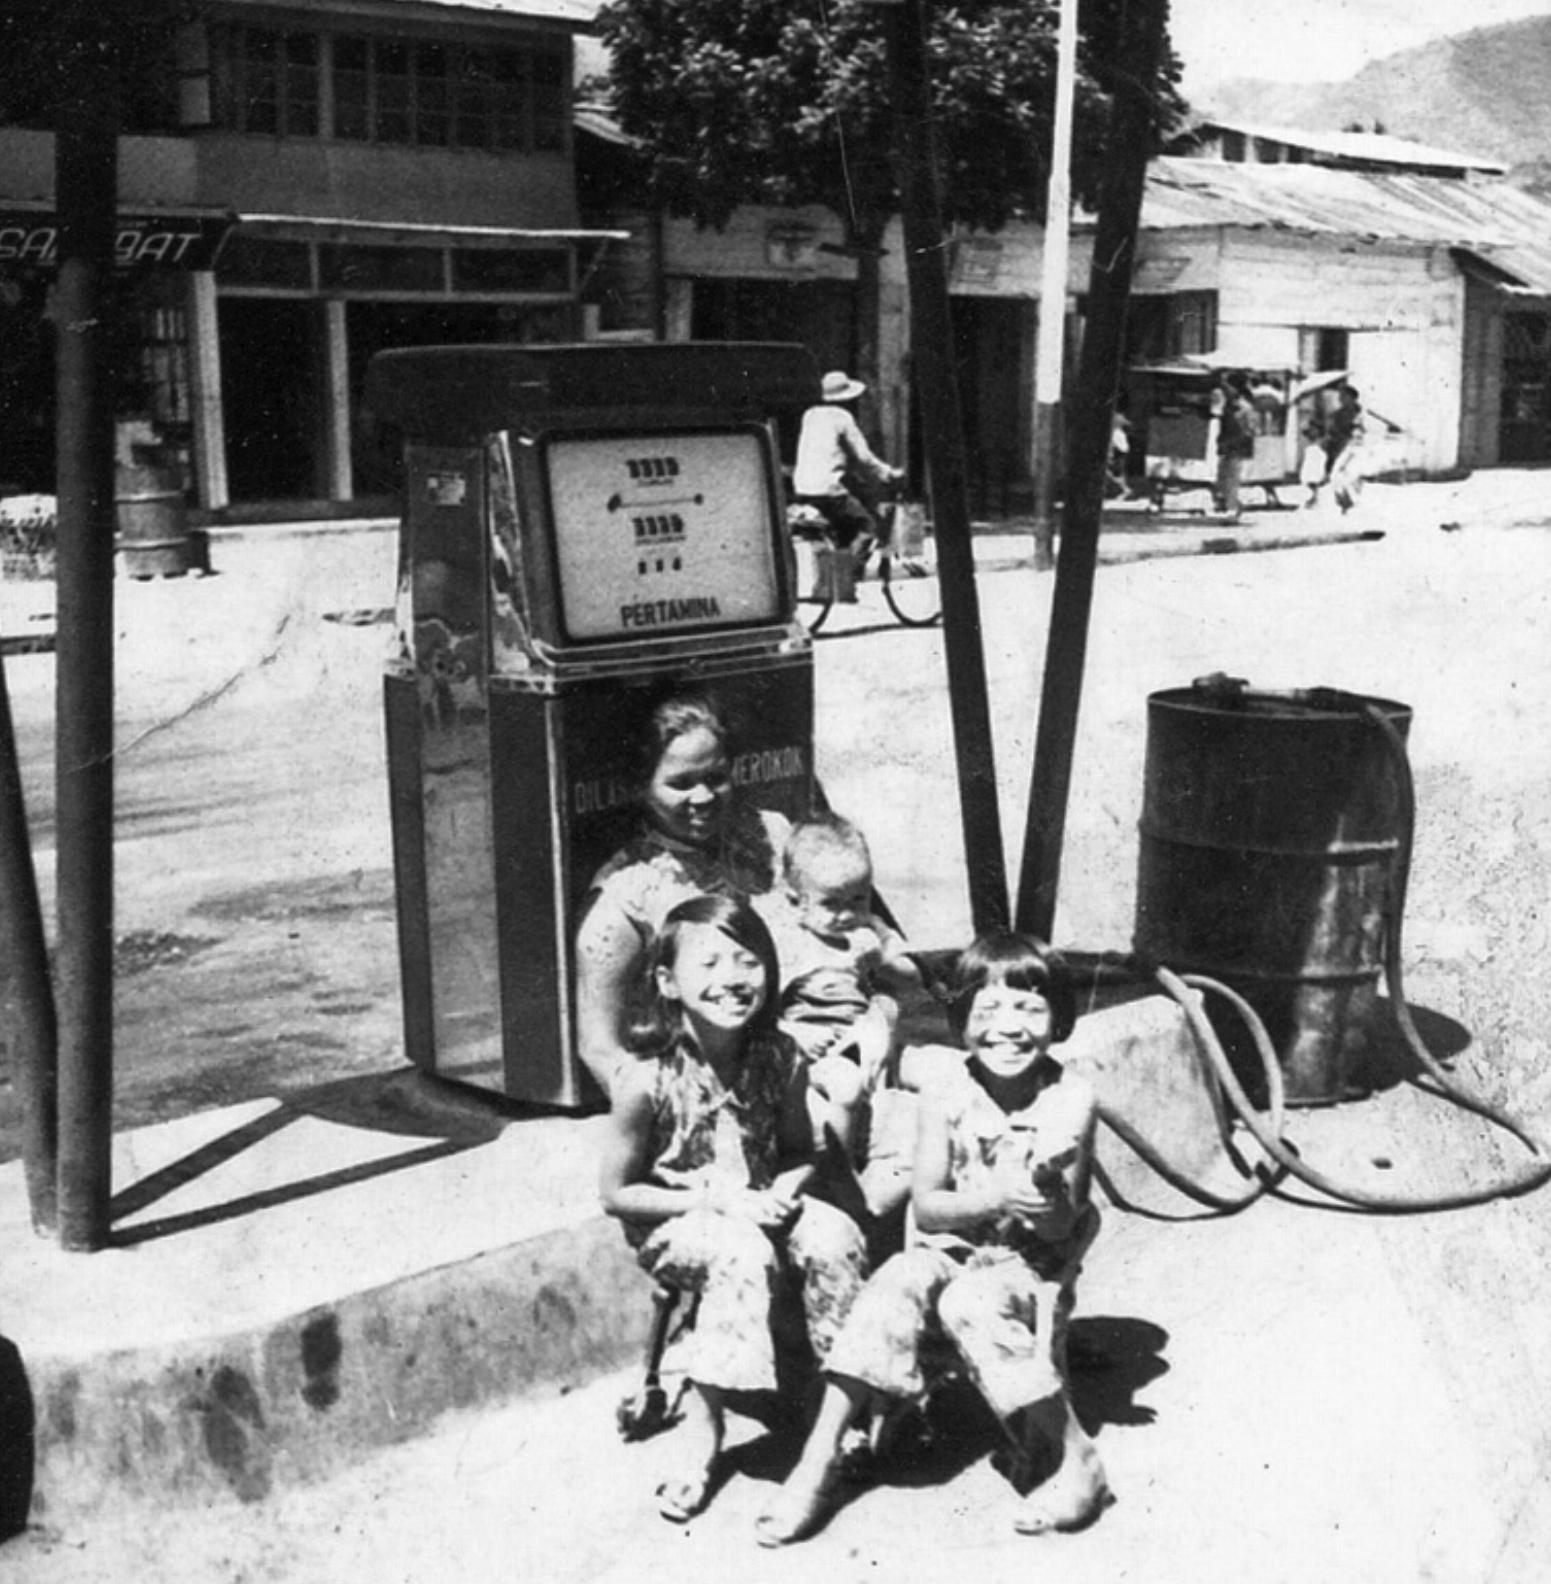 foto jadul pom bensin Barat di Balige Tobasa